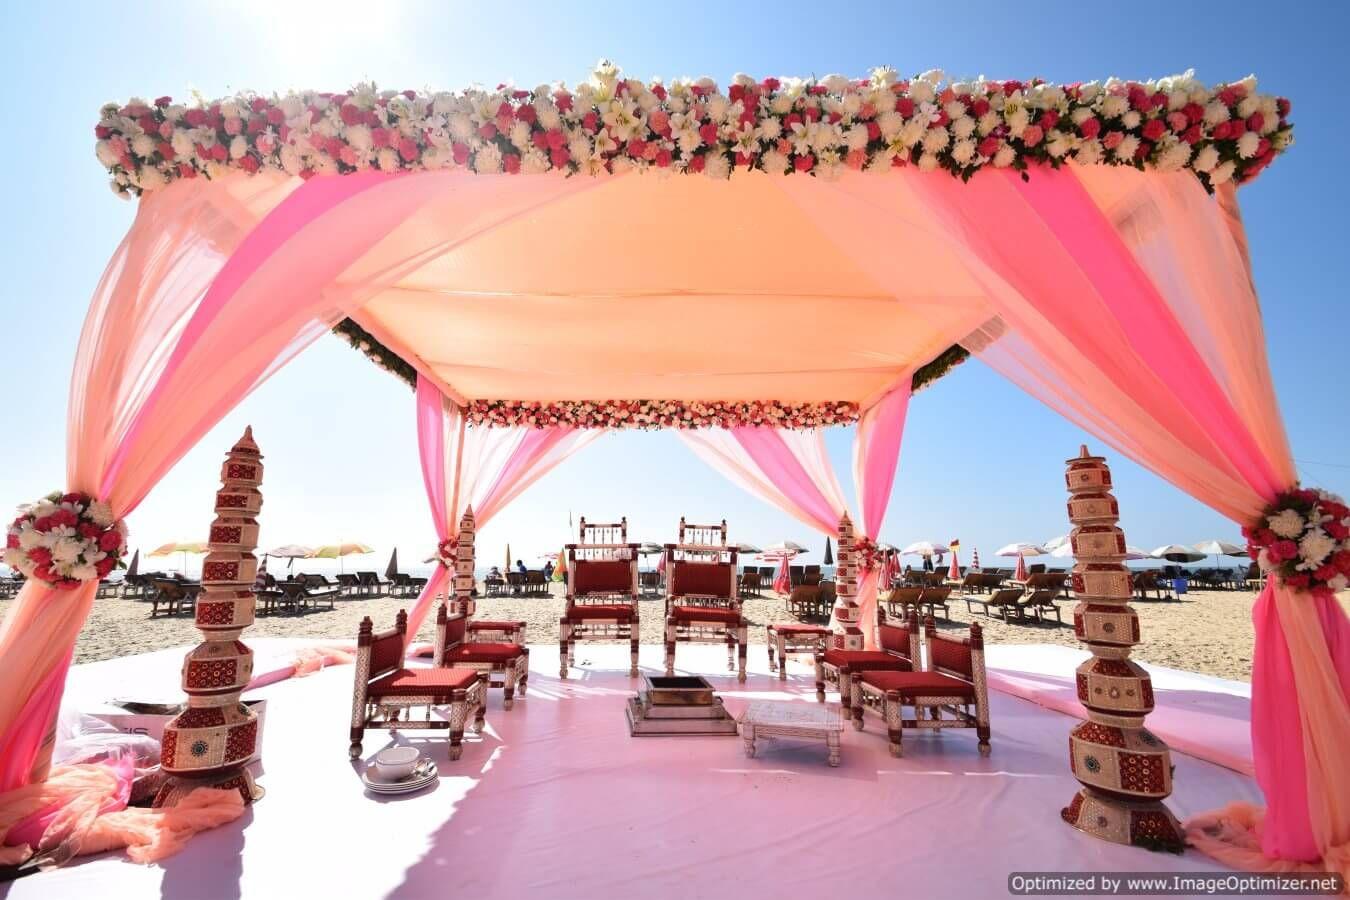 Beach wedding decor goa decor weddingplanning indianwedding beach wedding decor goa decor weddingplanning indianwedding junglespirit Images